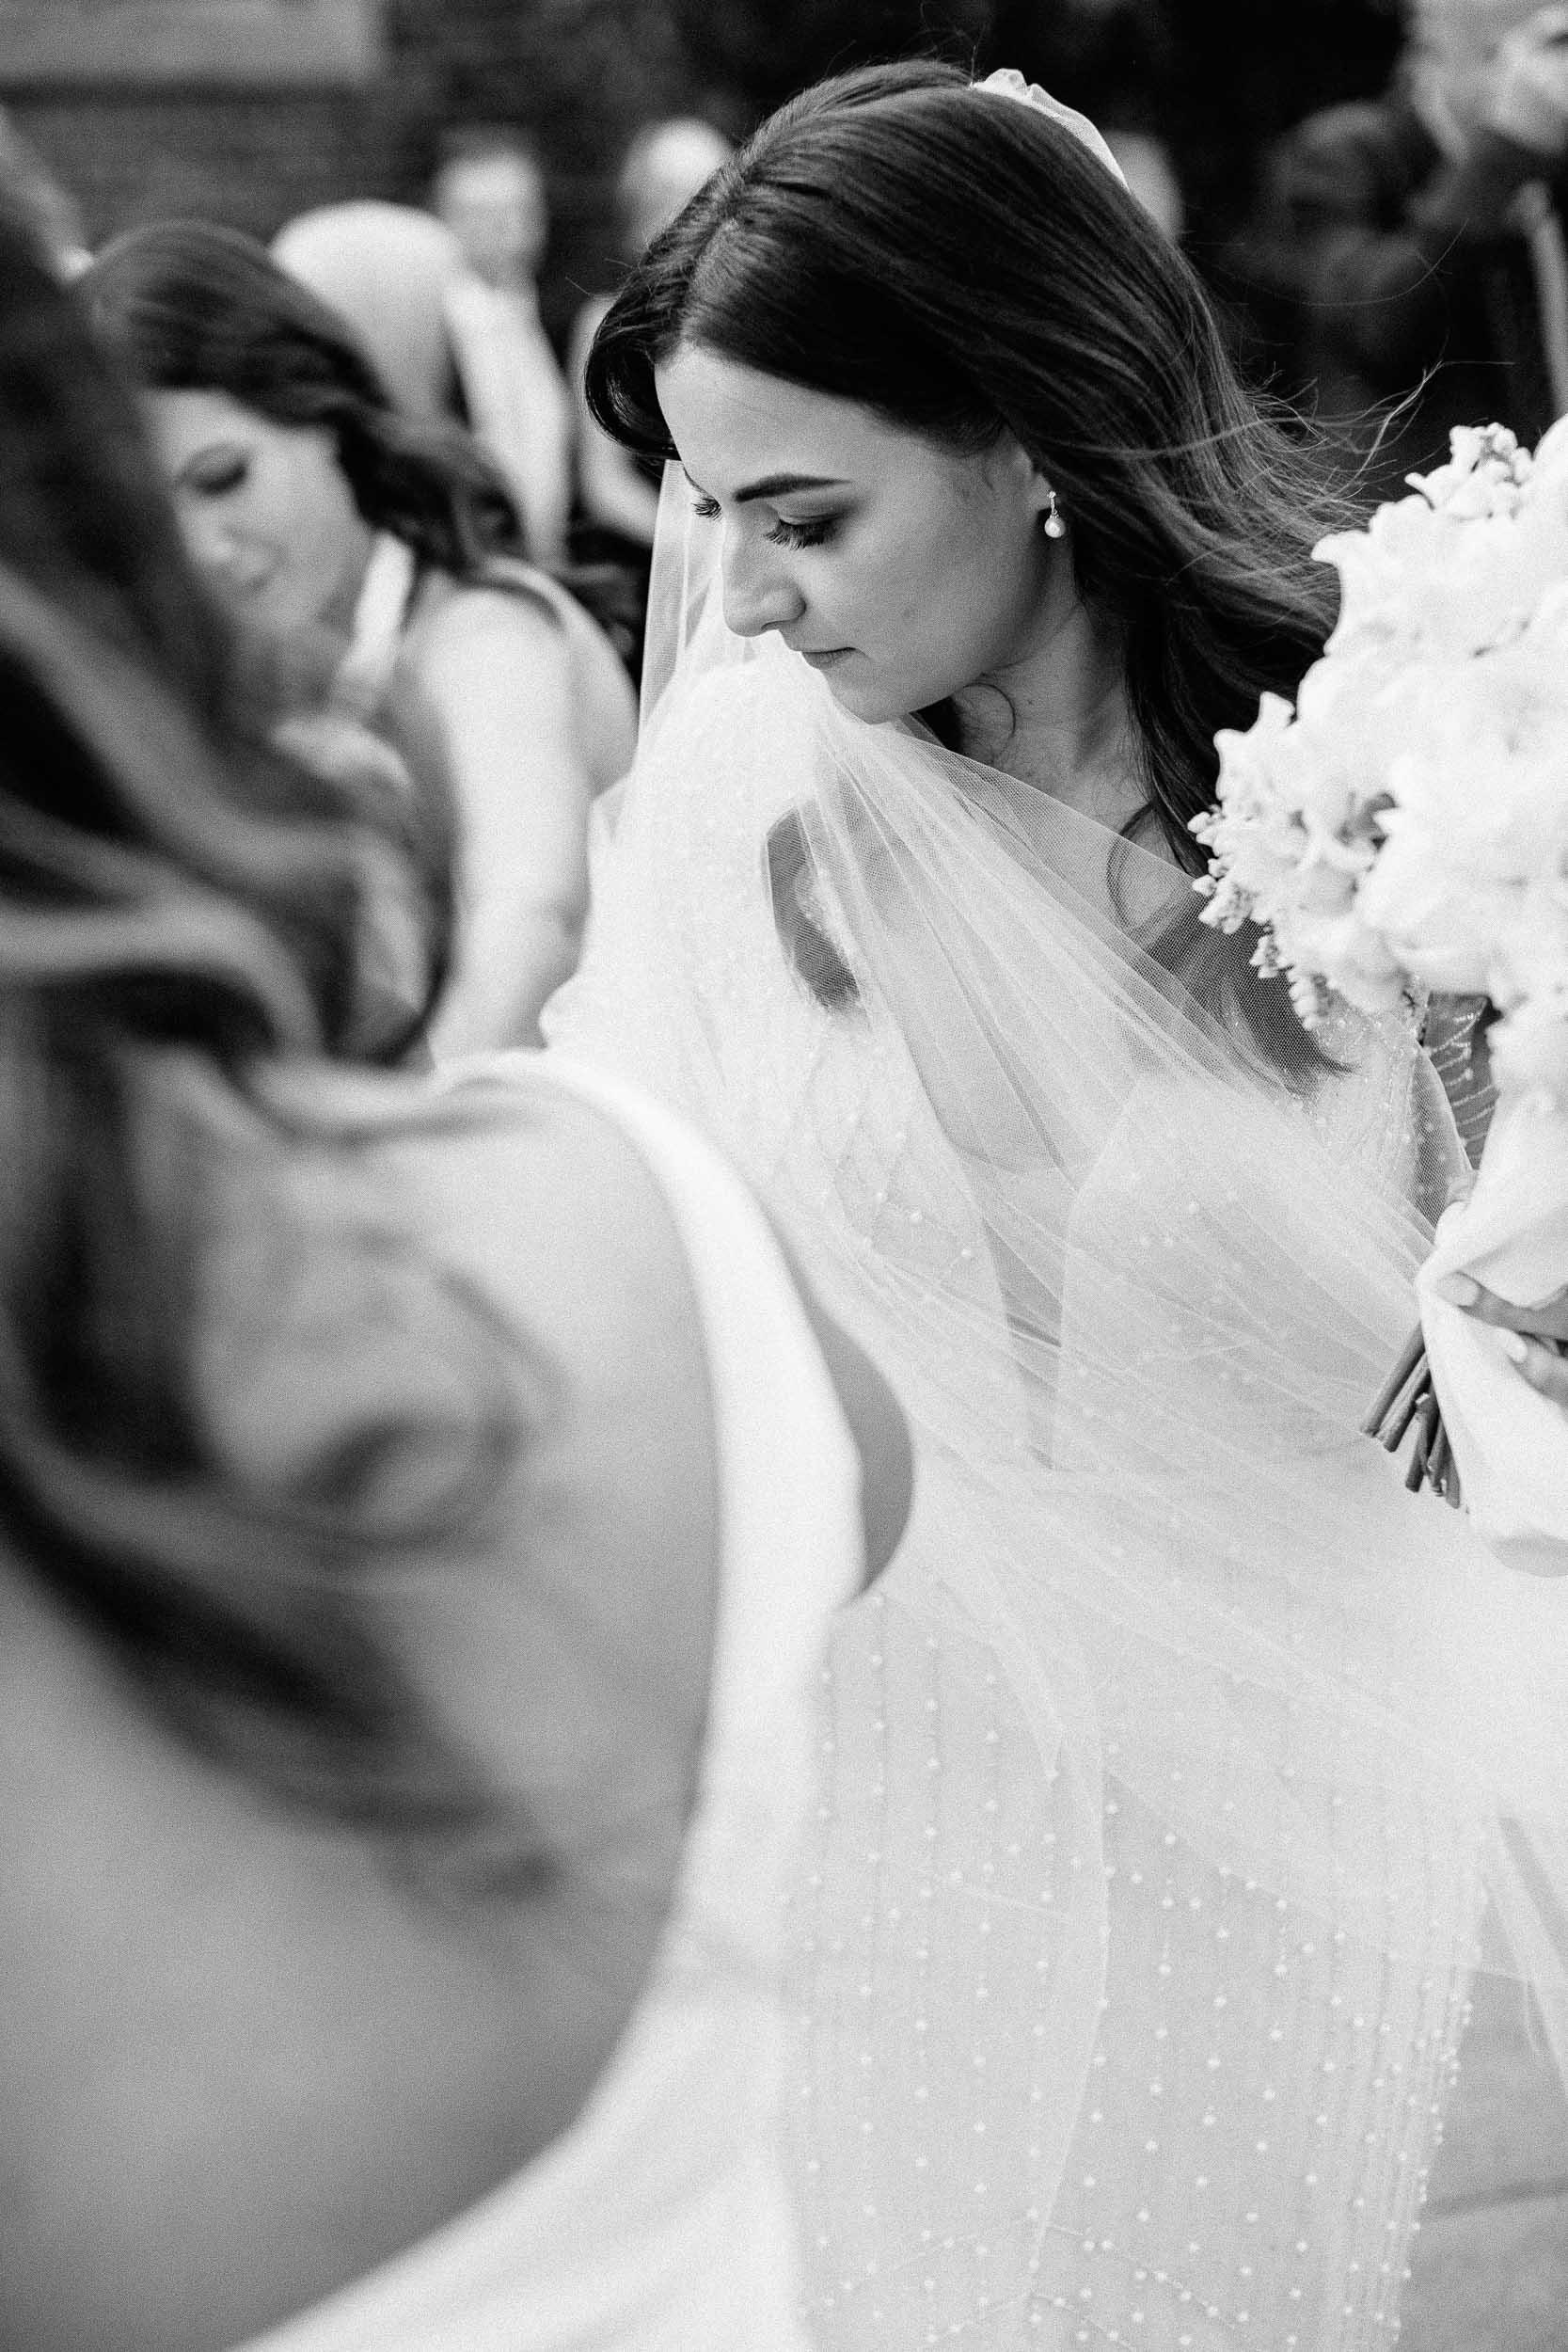 Kas-Richards-Wedding-Photographer-Melbourne-City-Wedding-Alto-Event-Space-Jane-Hill-Bridal-Gown-36.jpg